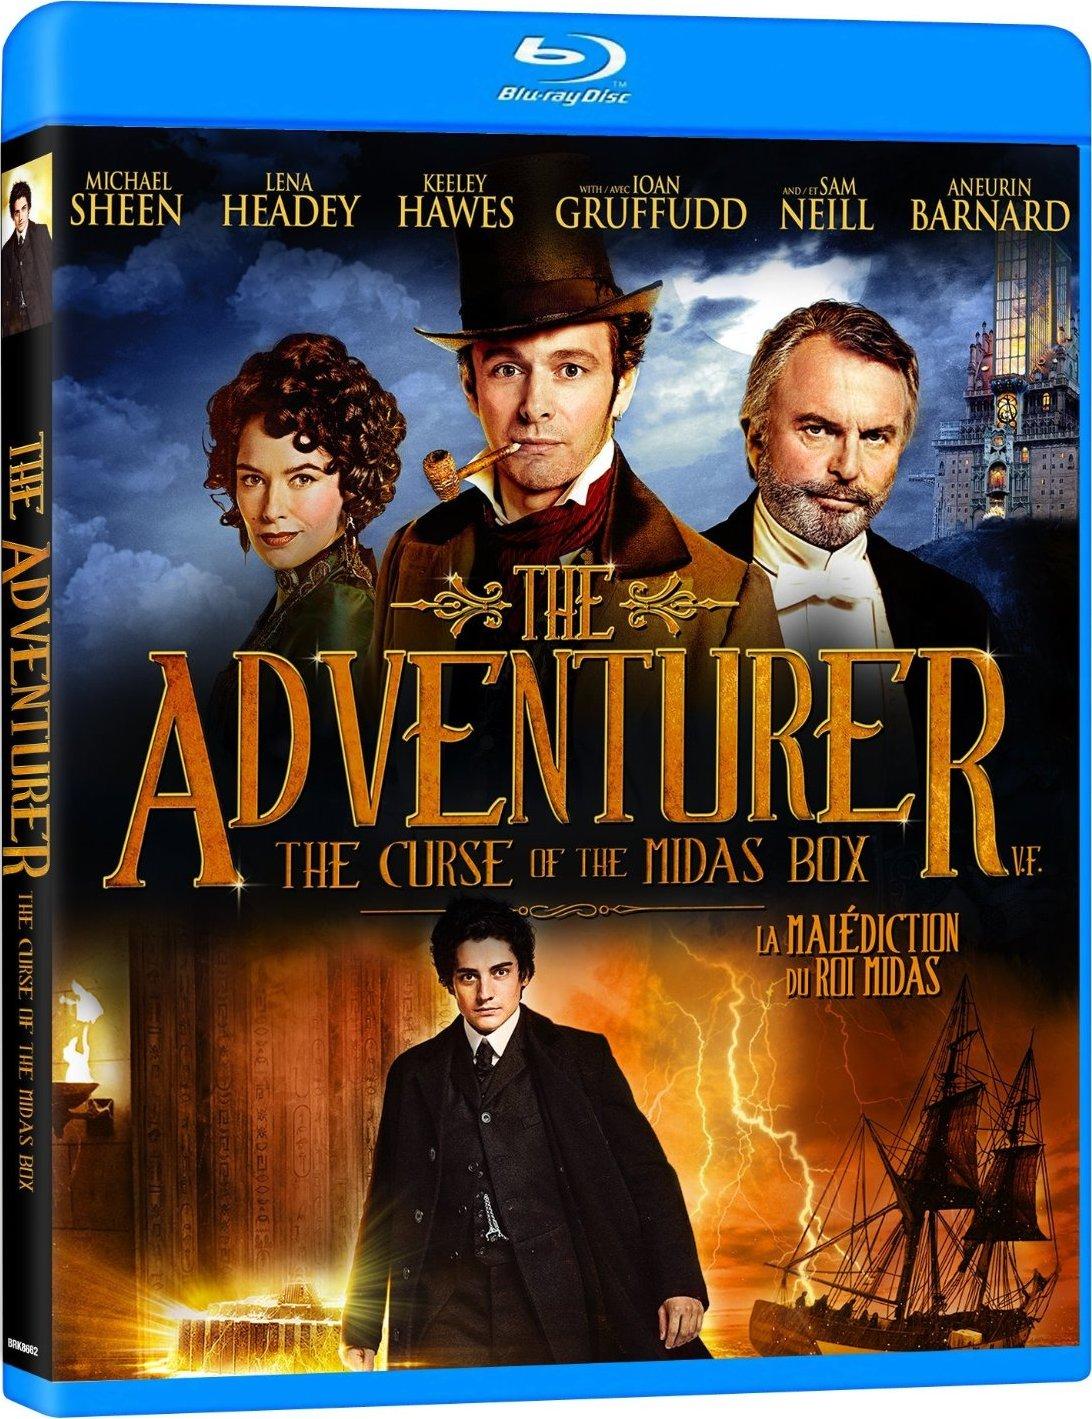 The Adventurer: The Curse of the Midas Box / Авантюристът: Проклятието на Мидаското ковчеже (2013)